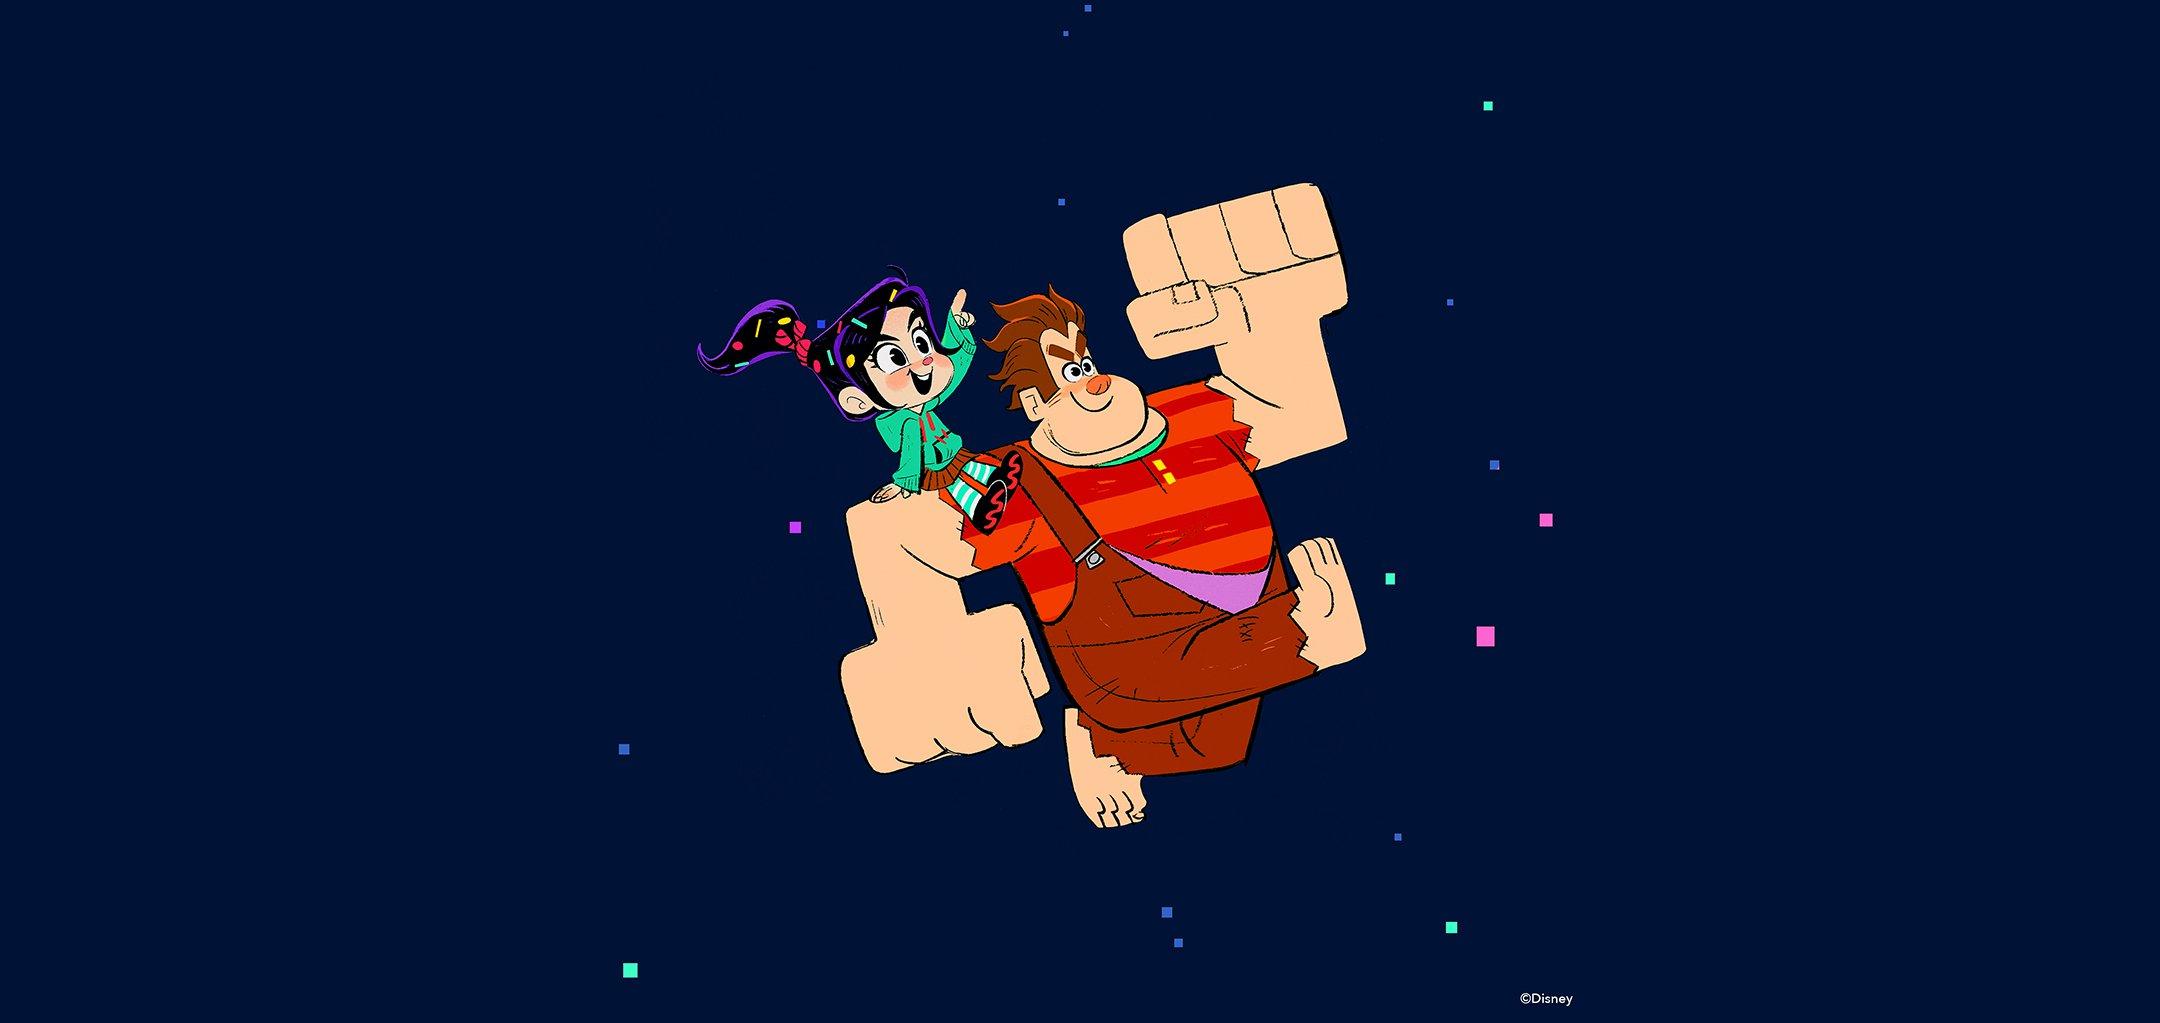 Ralph Breaks the Internet: Wreck it Ralph 2 (2018) Ami Thompson, Concept art, digital painting. © Disney